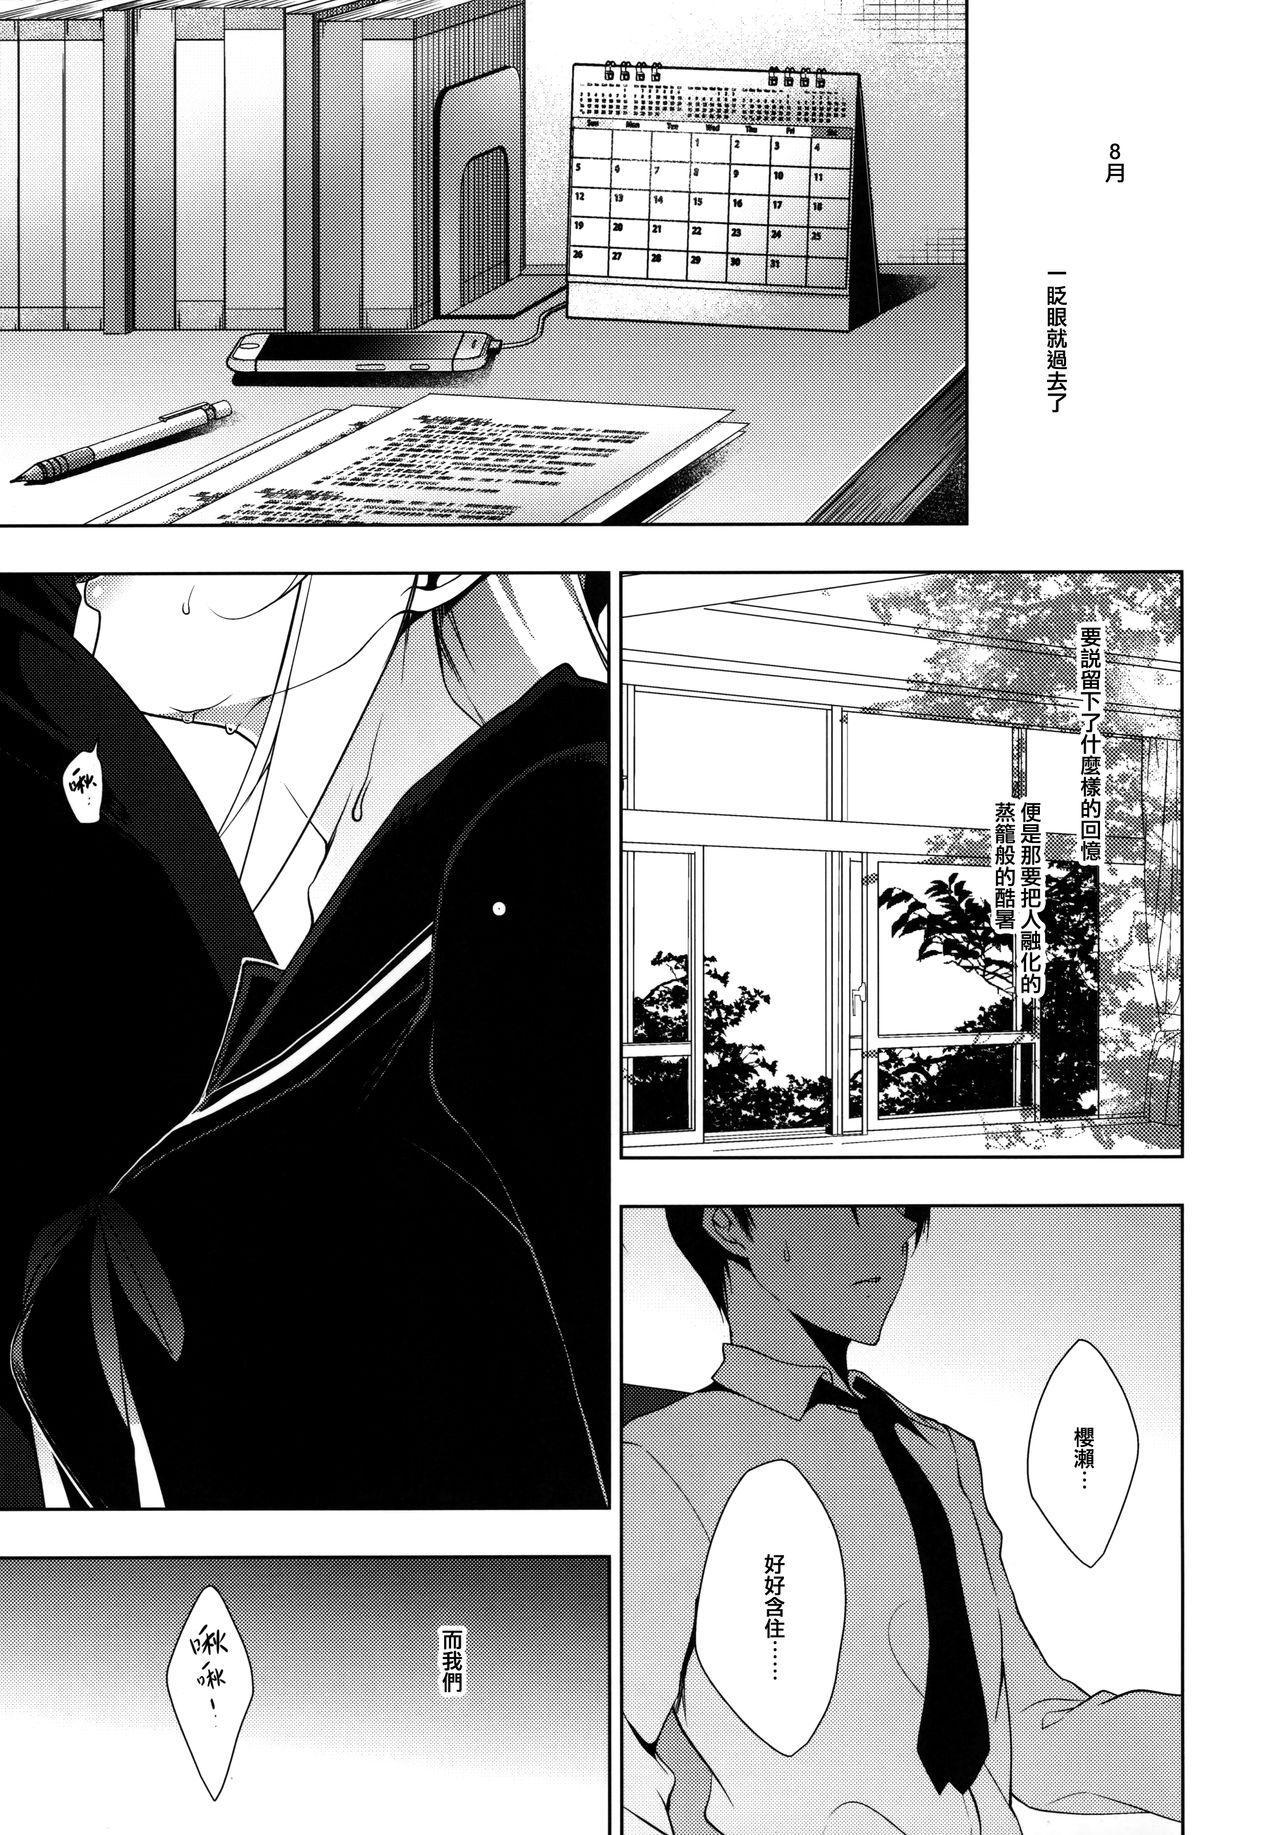 Shoujo Kaishun 7 + Ninokoya C97 Melonbooks Omakebon 4